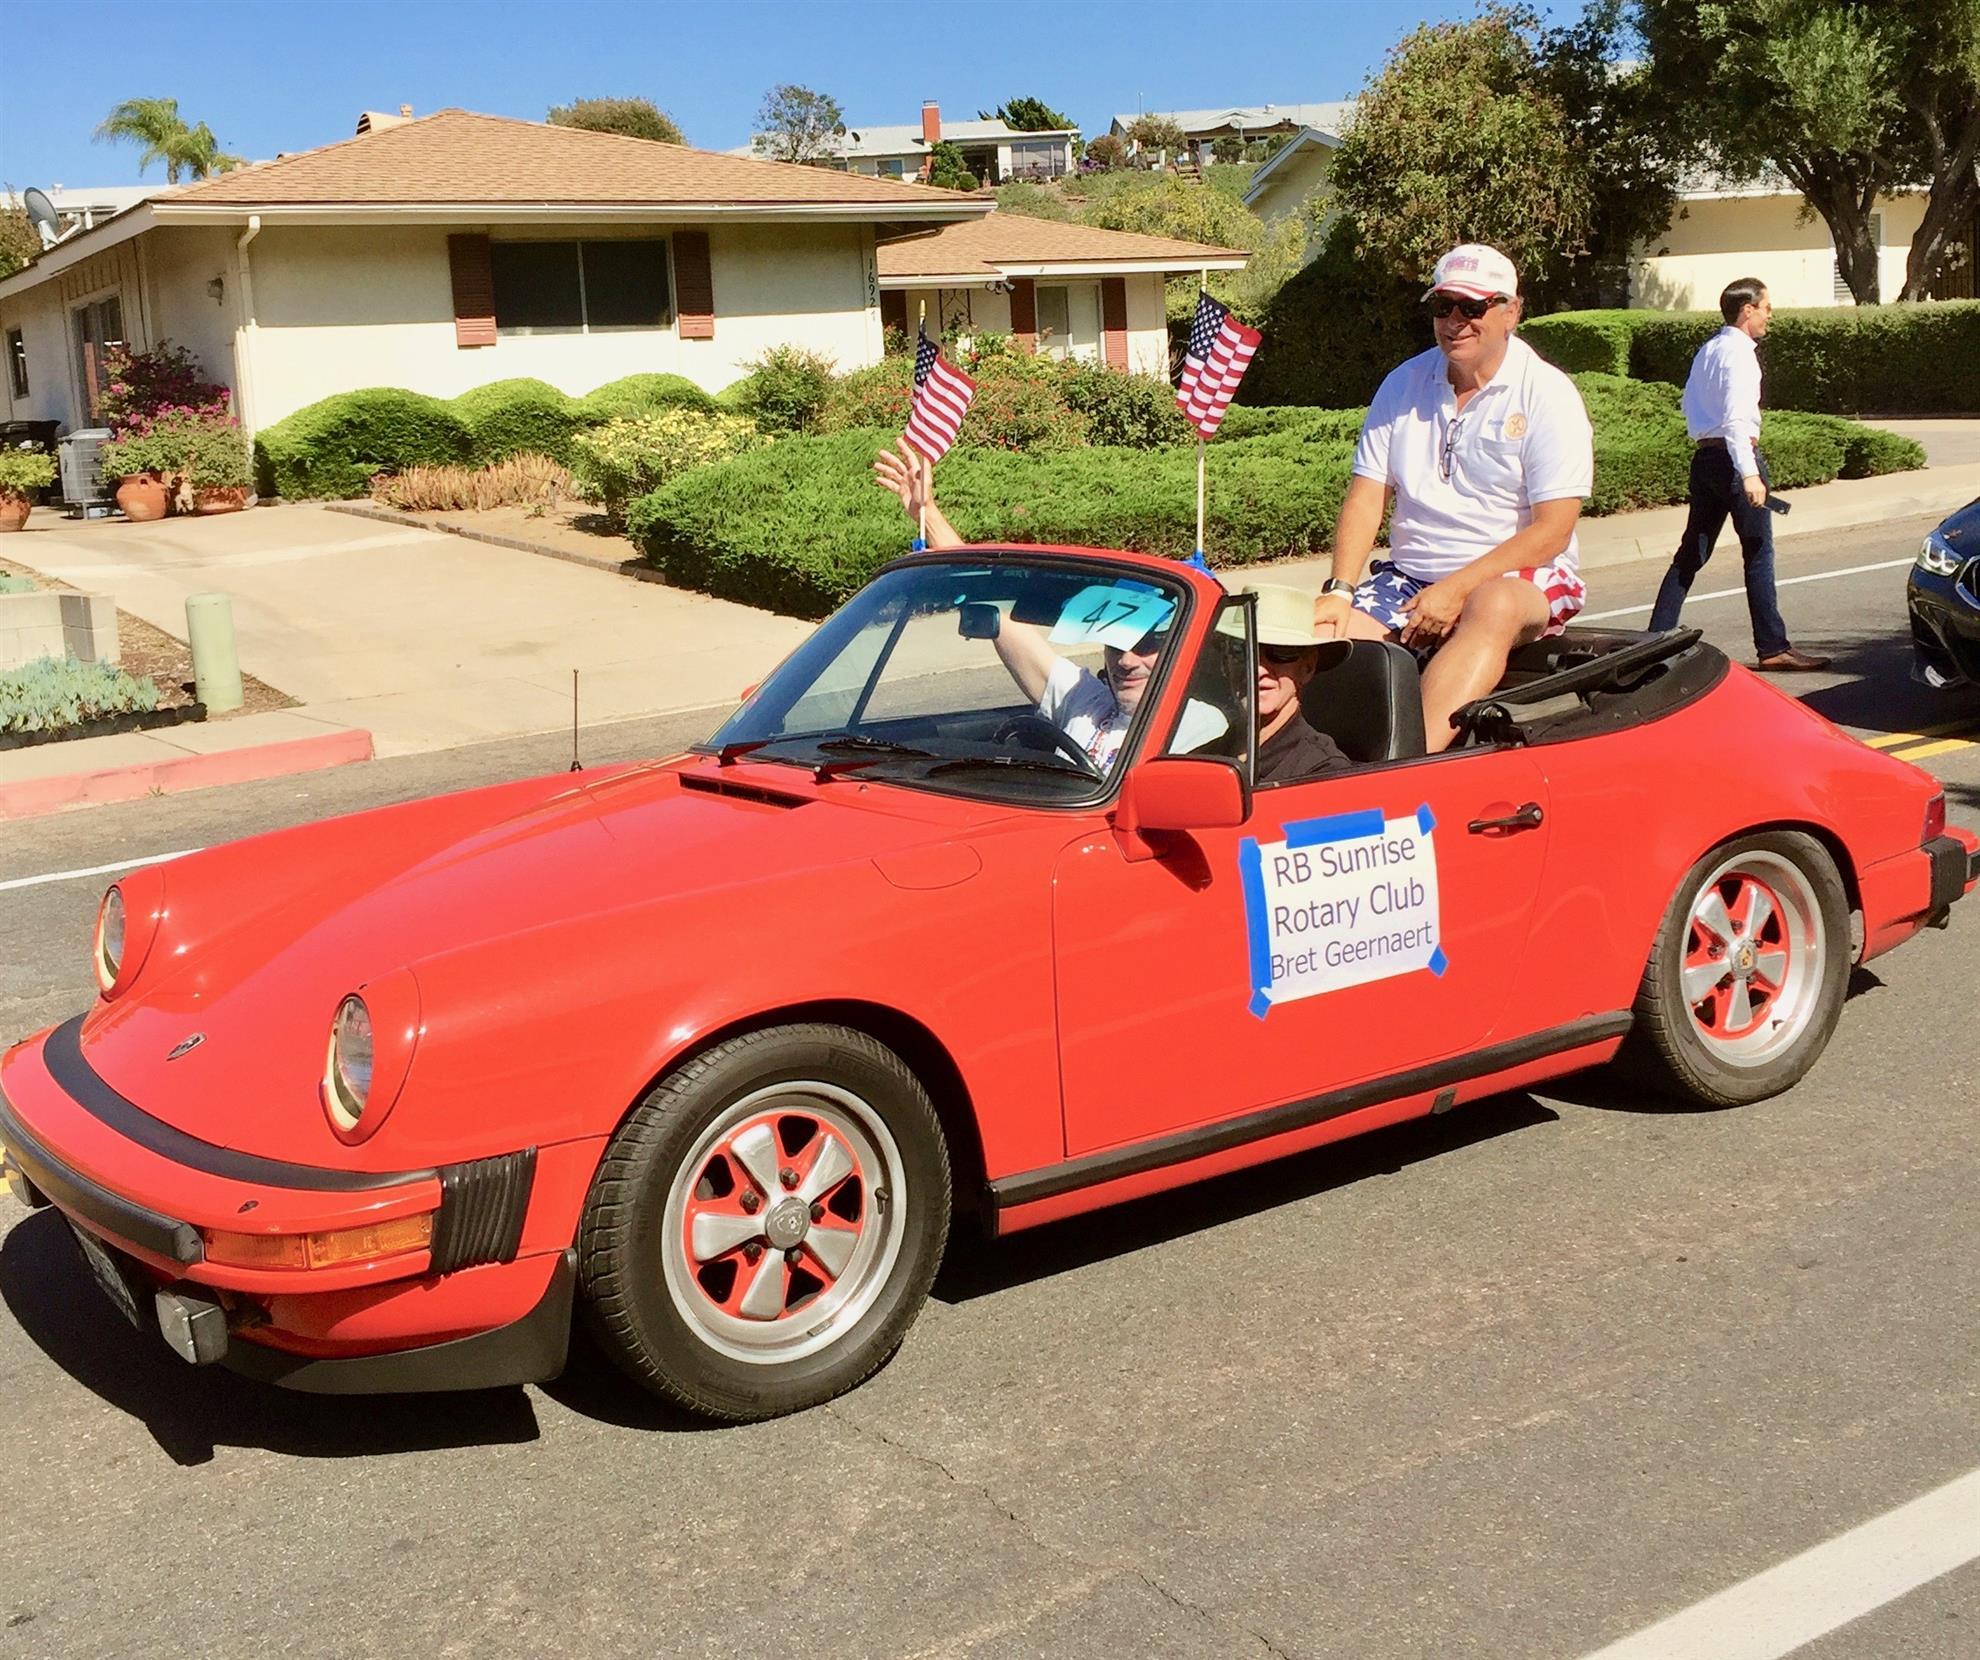 Stories | Rotary Club of Rancho Bernardo Sunrise (San Diego)